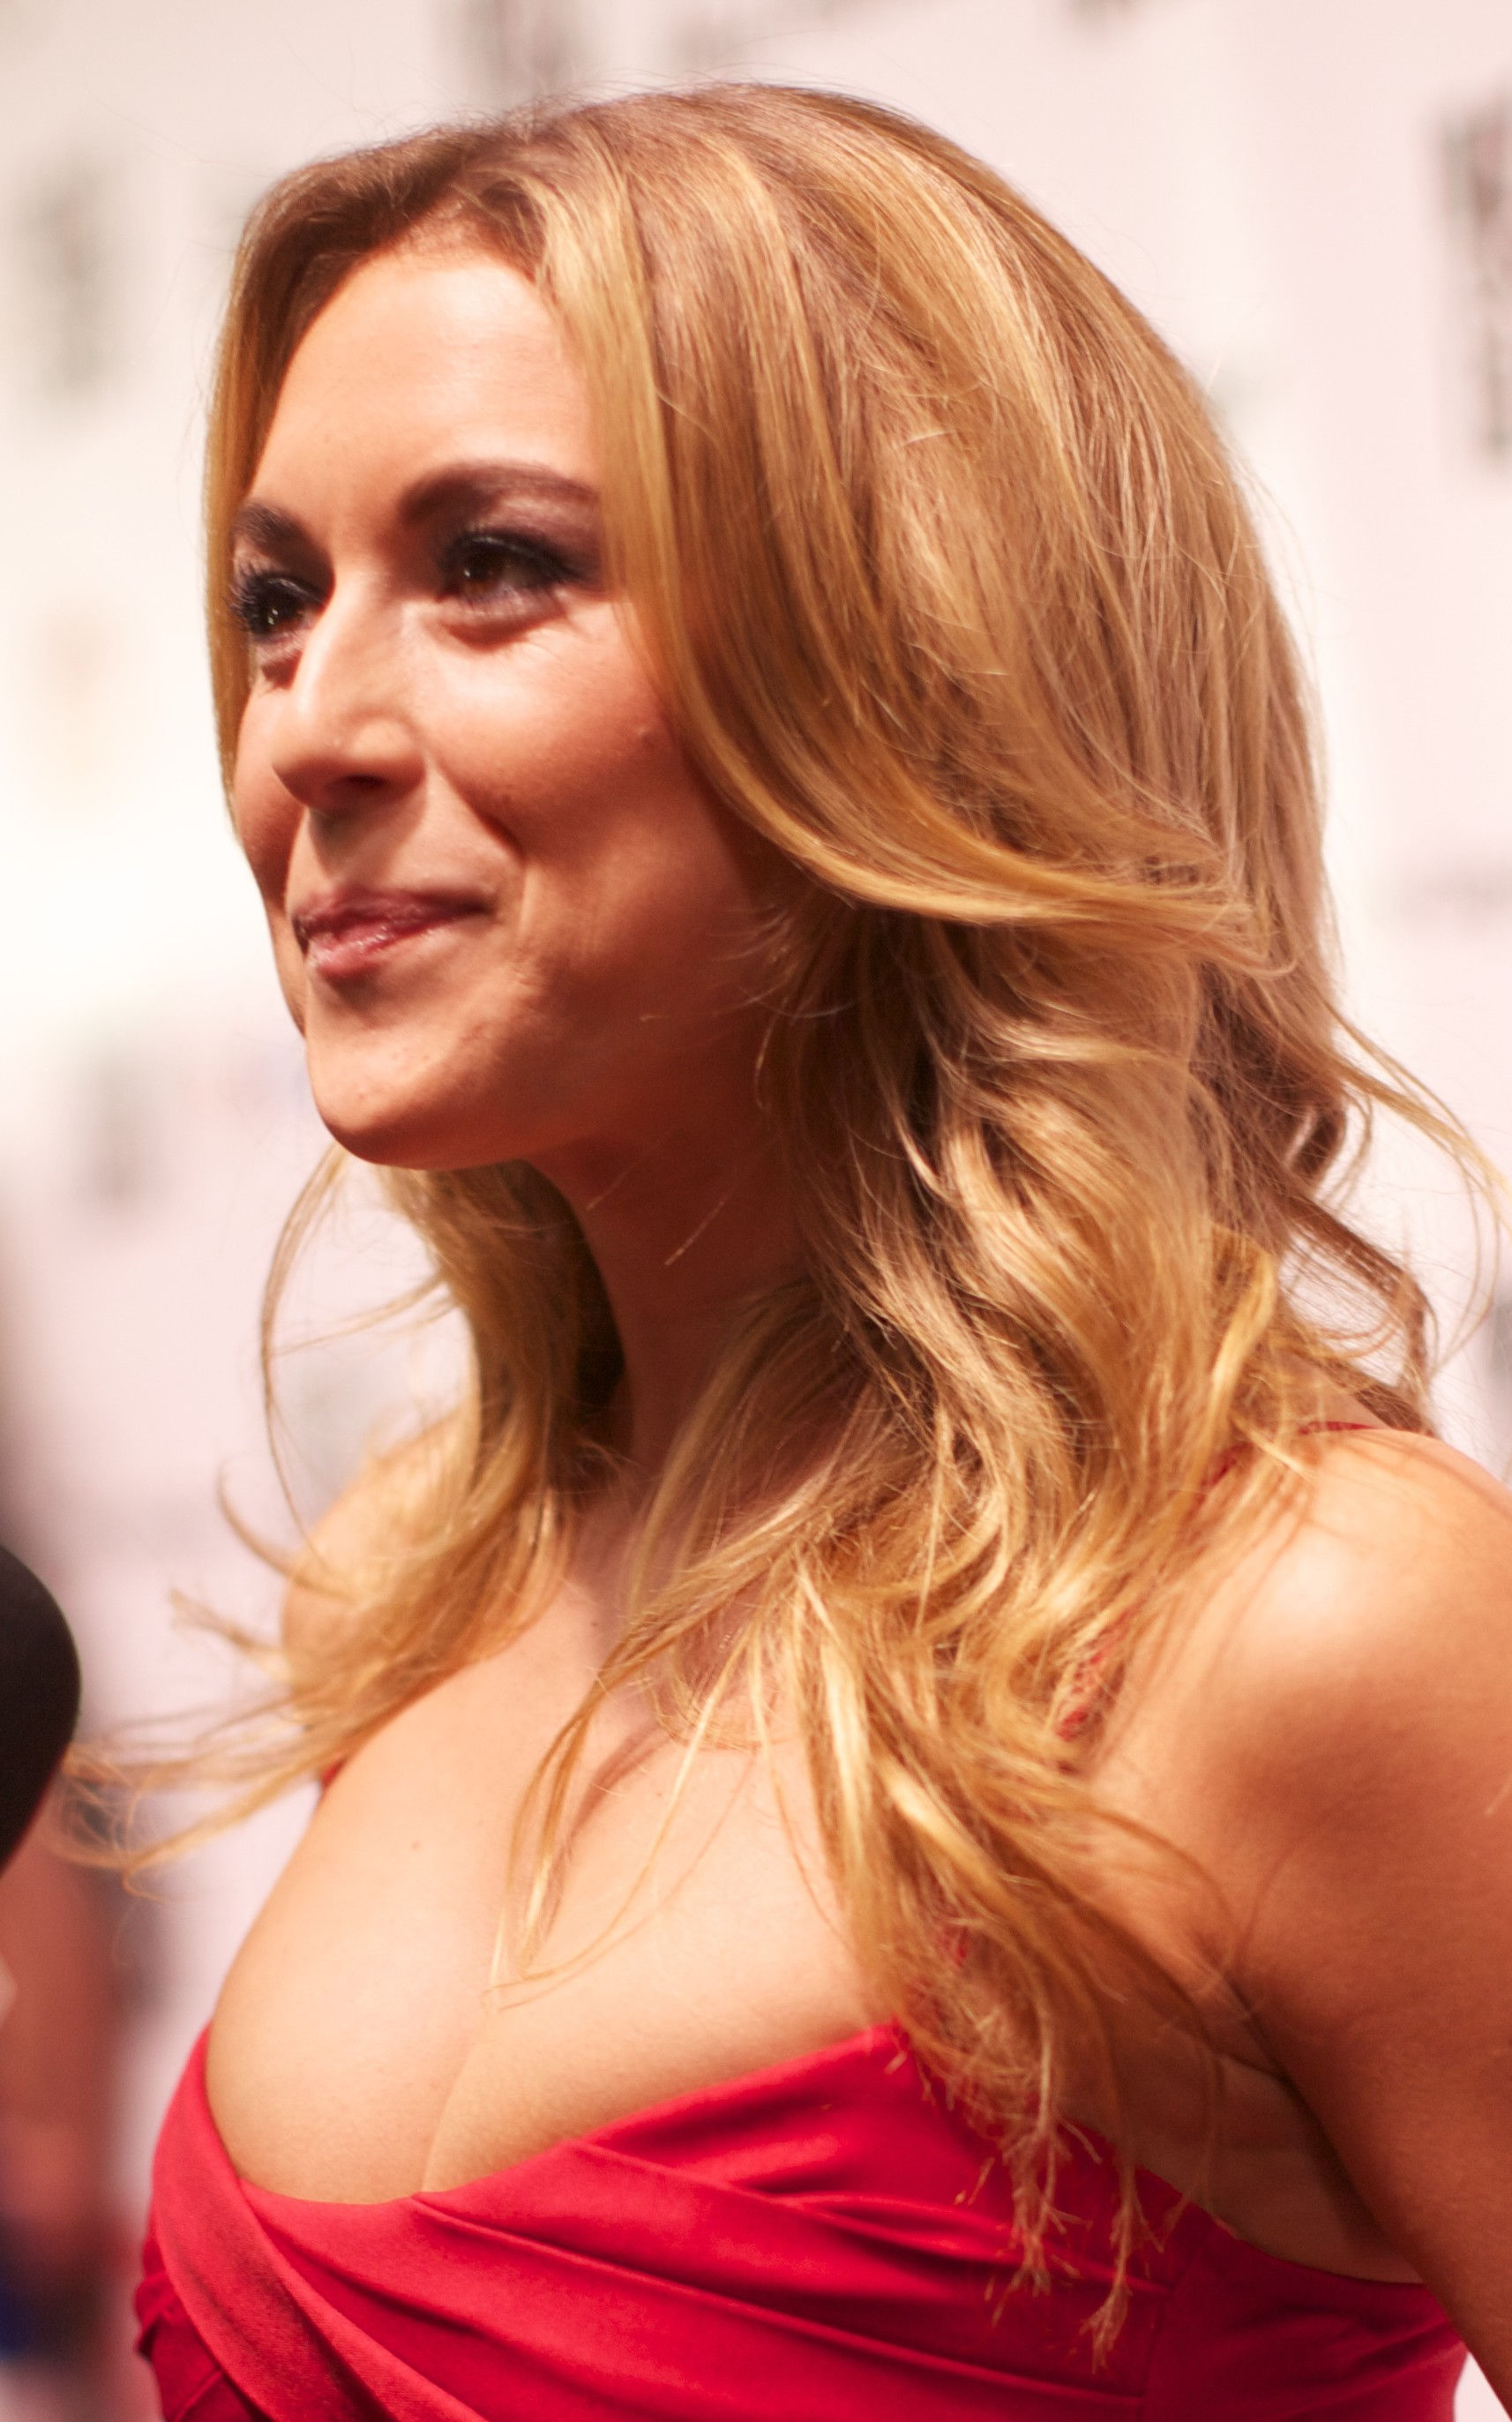 Photo of Alexa Vega: American actress and singer.